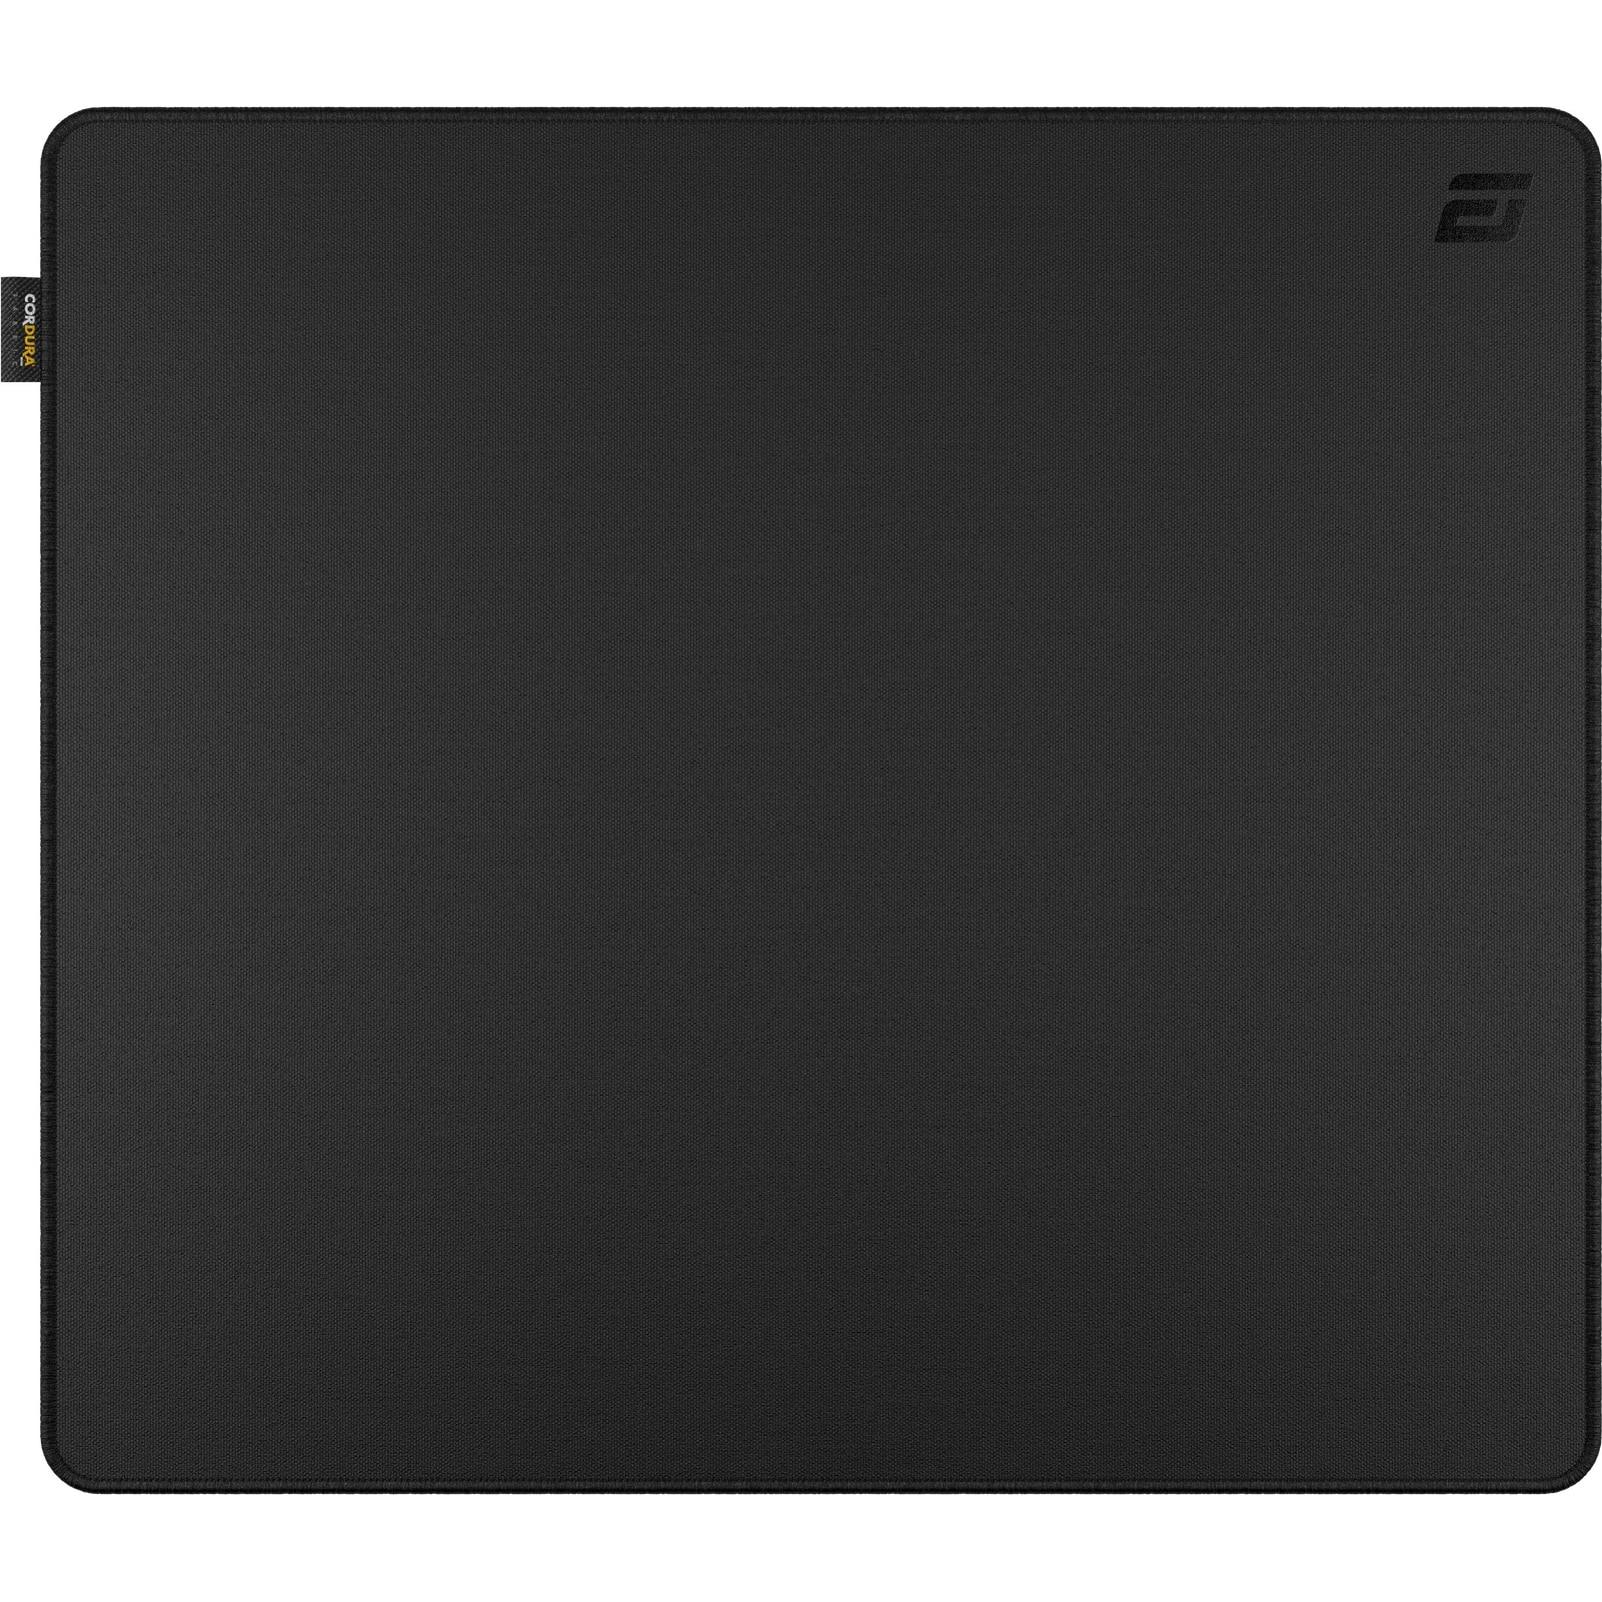 Fotografie Mousepad gaming Endgame Gear MPC450, Suprafata Cordura, 450x400x3mm, Negru